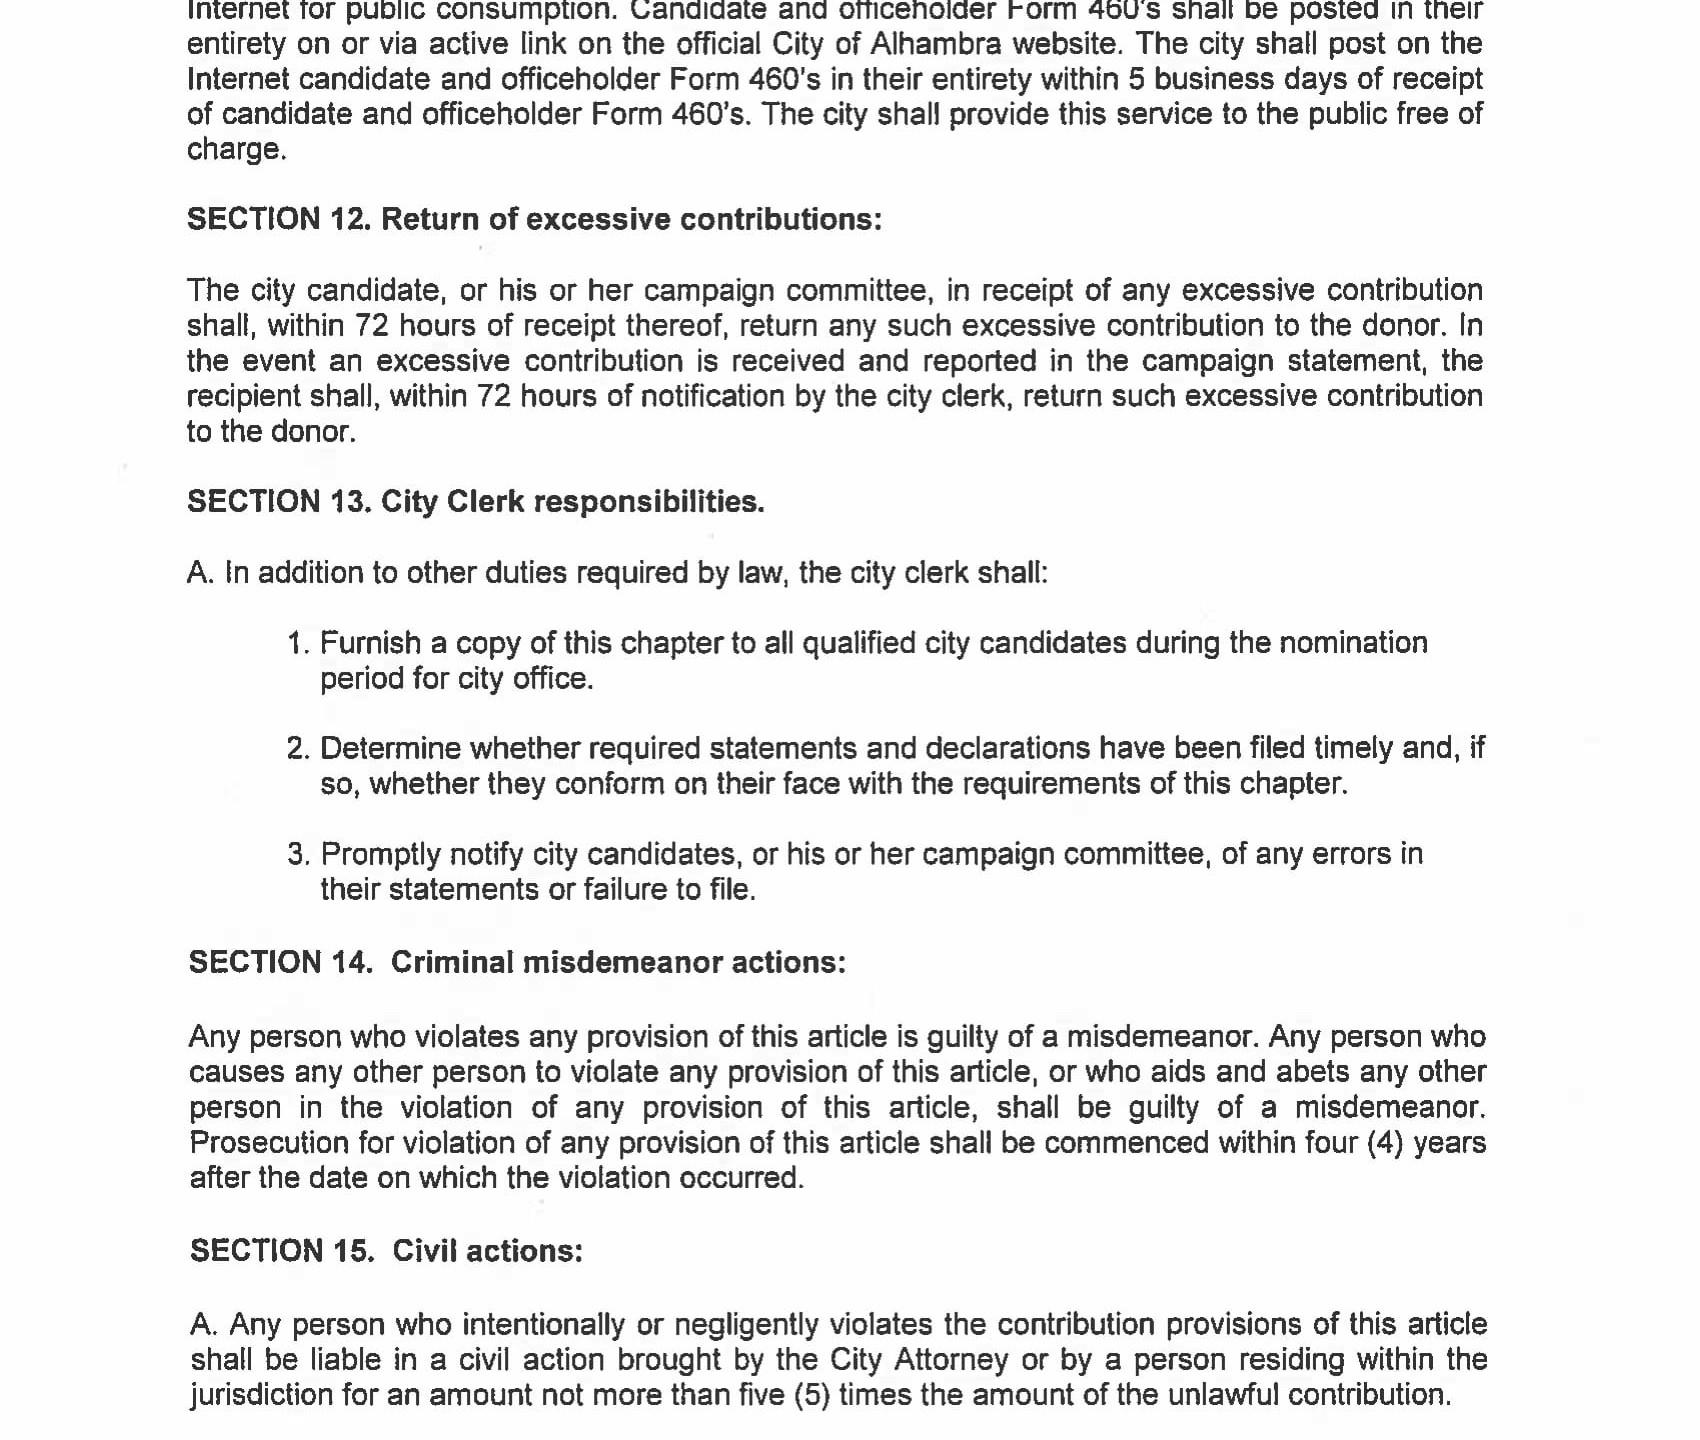 Initiative paperwork stamped by city clerk-11